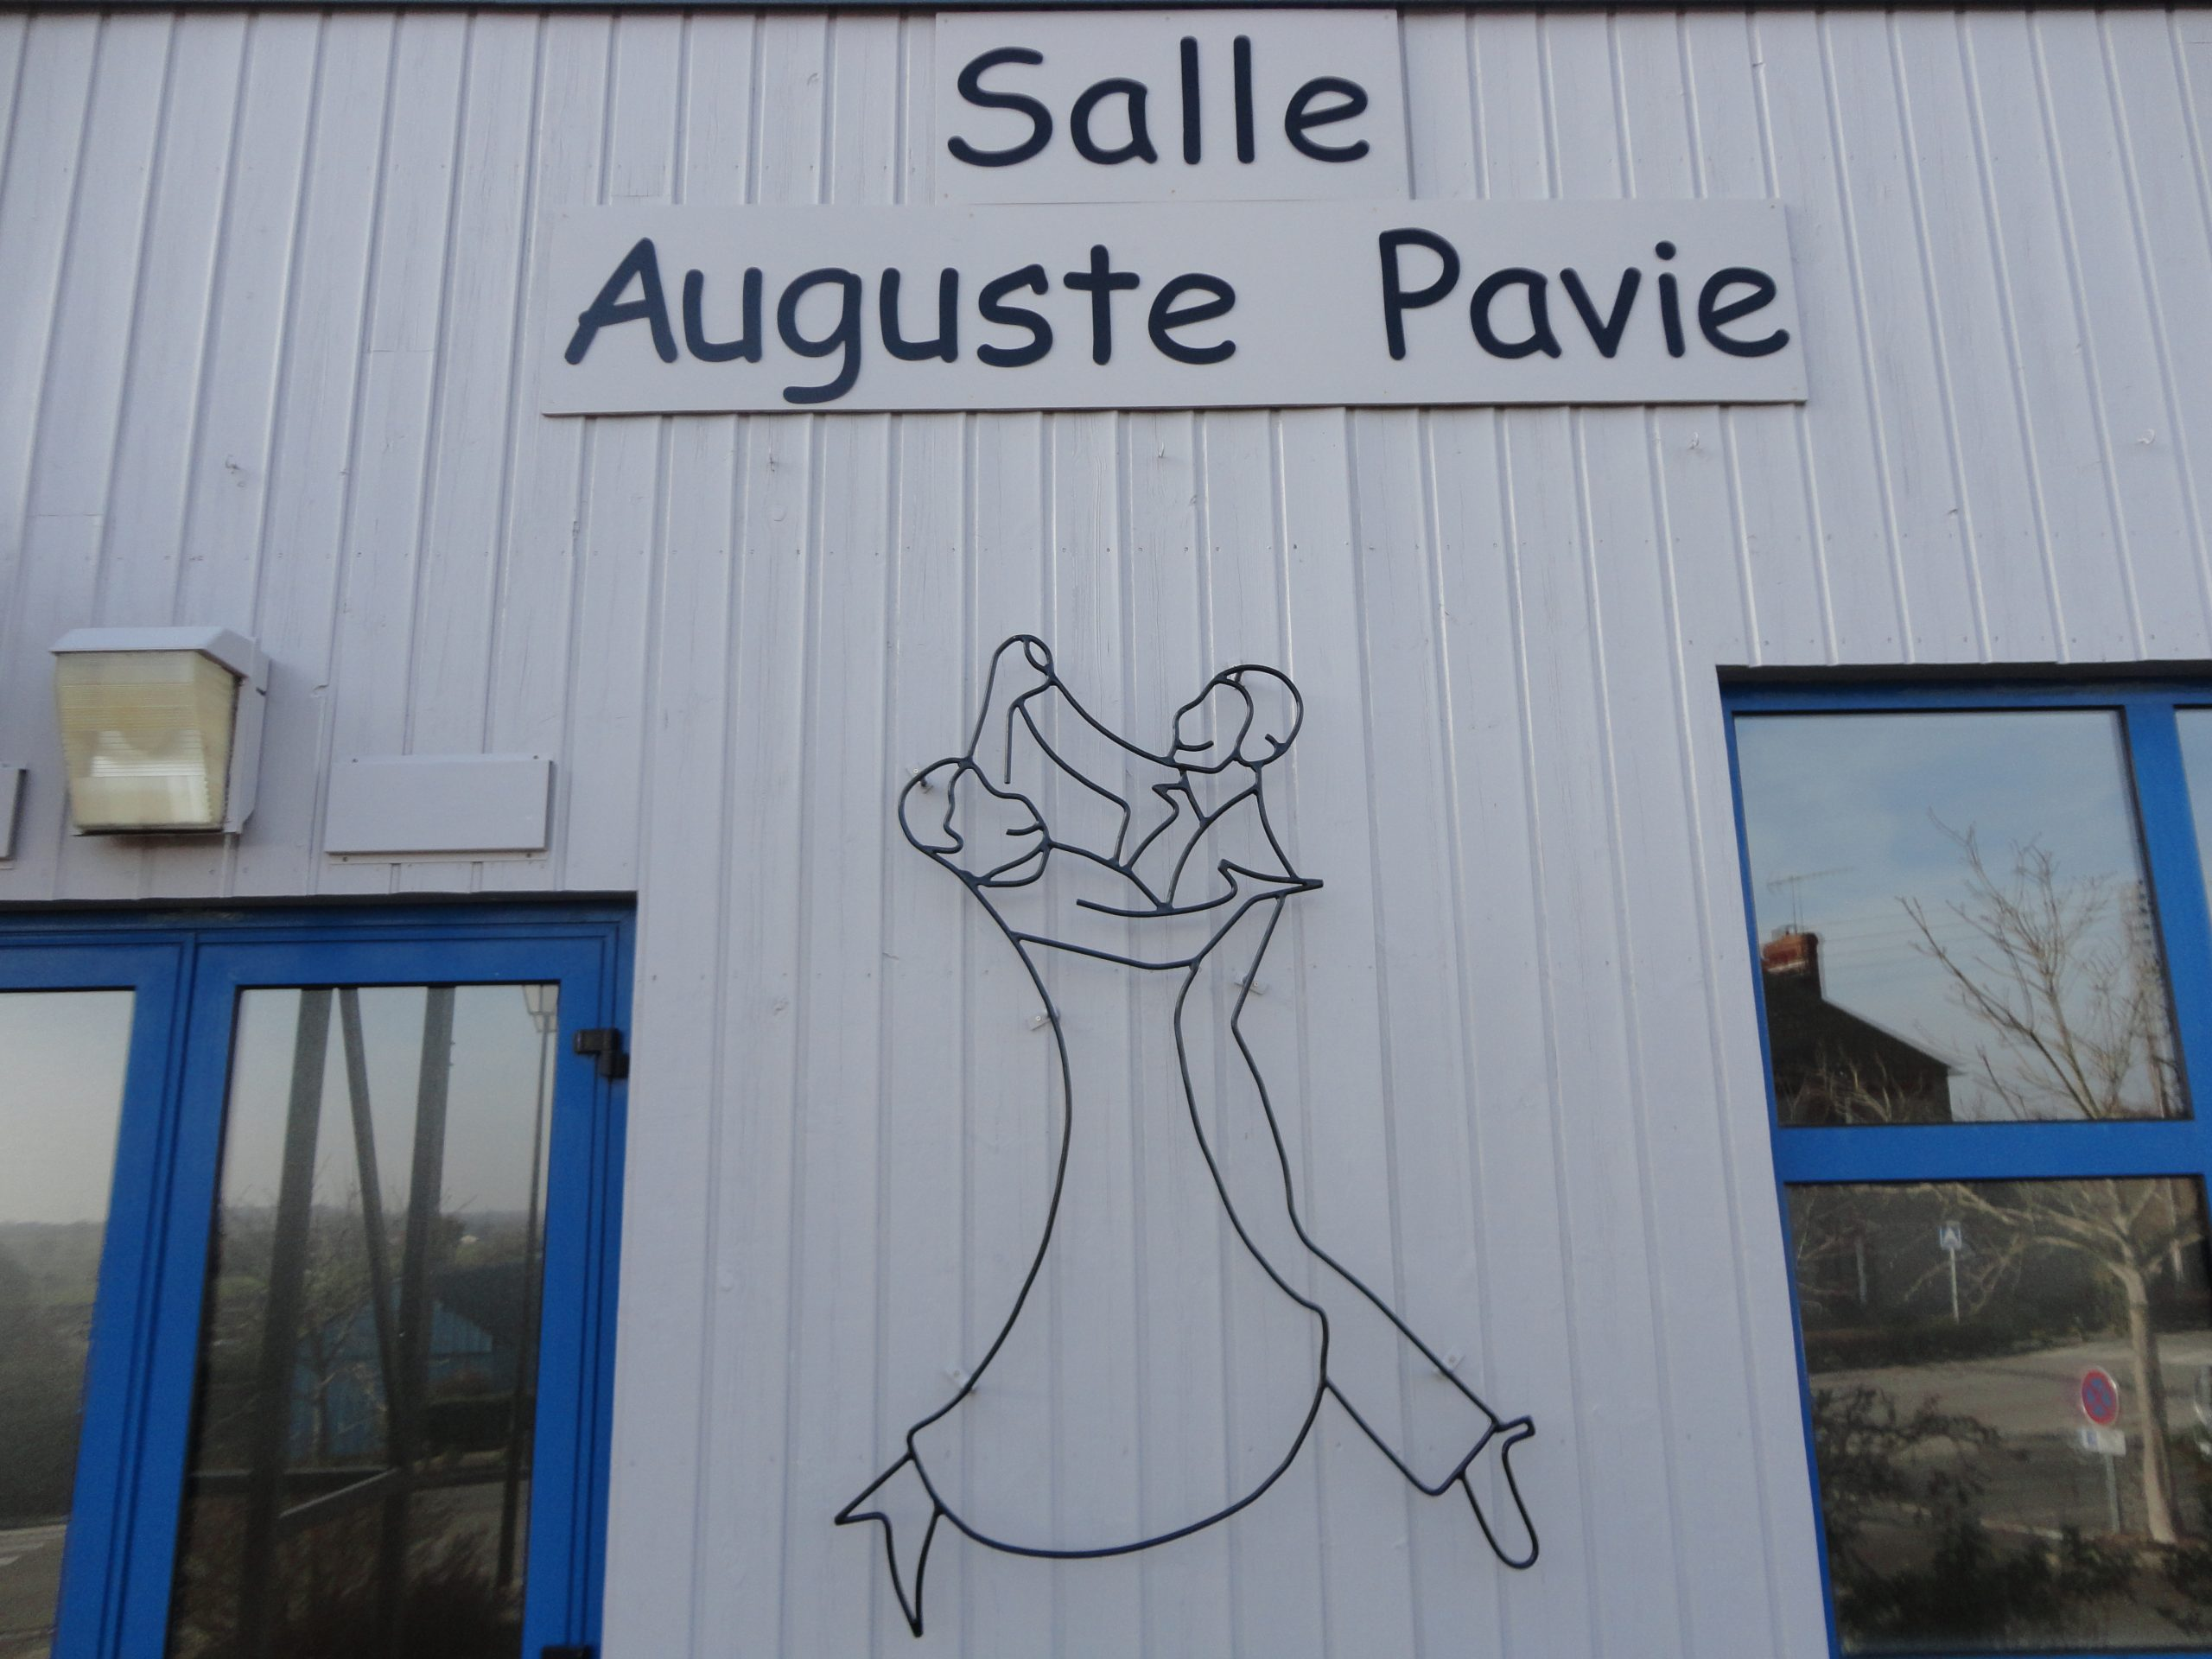 Salle A. Pavie Danse